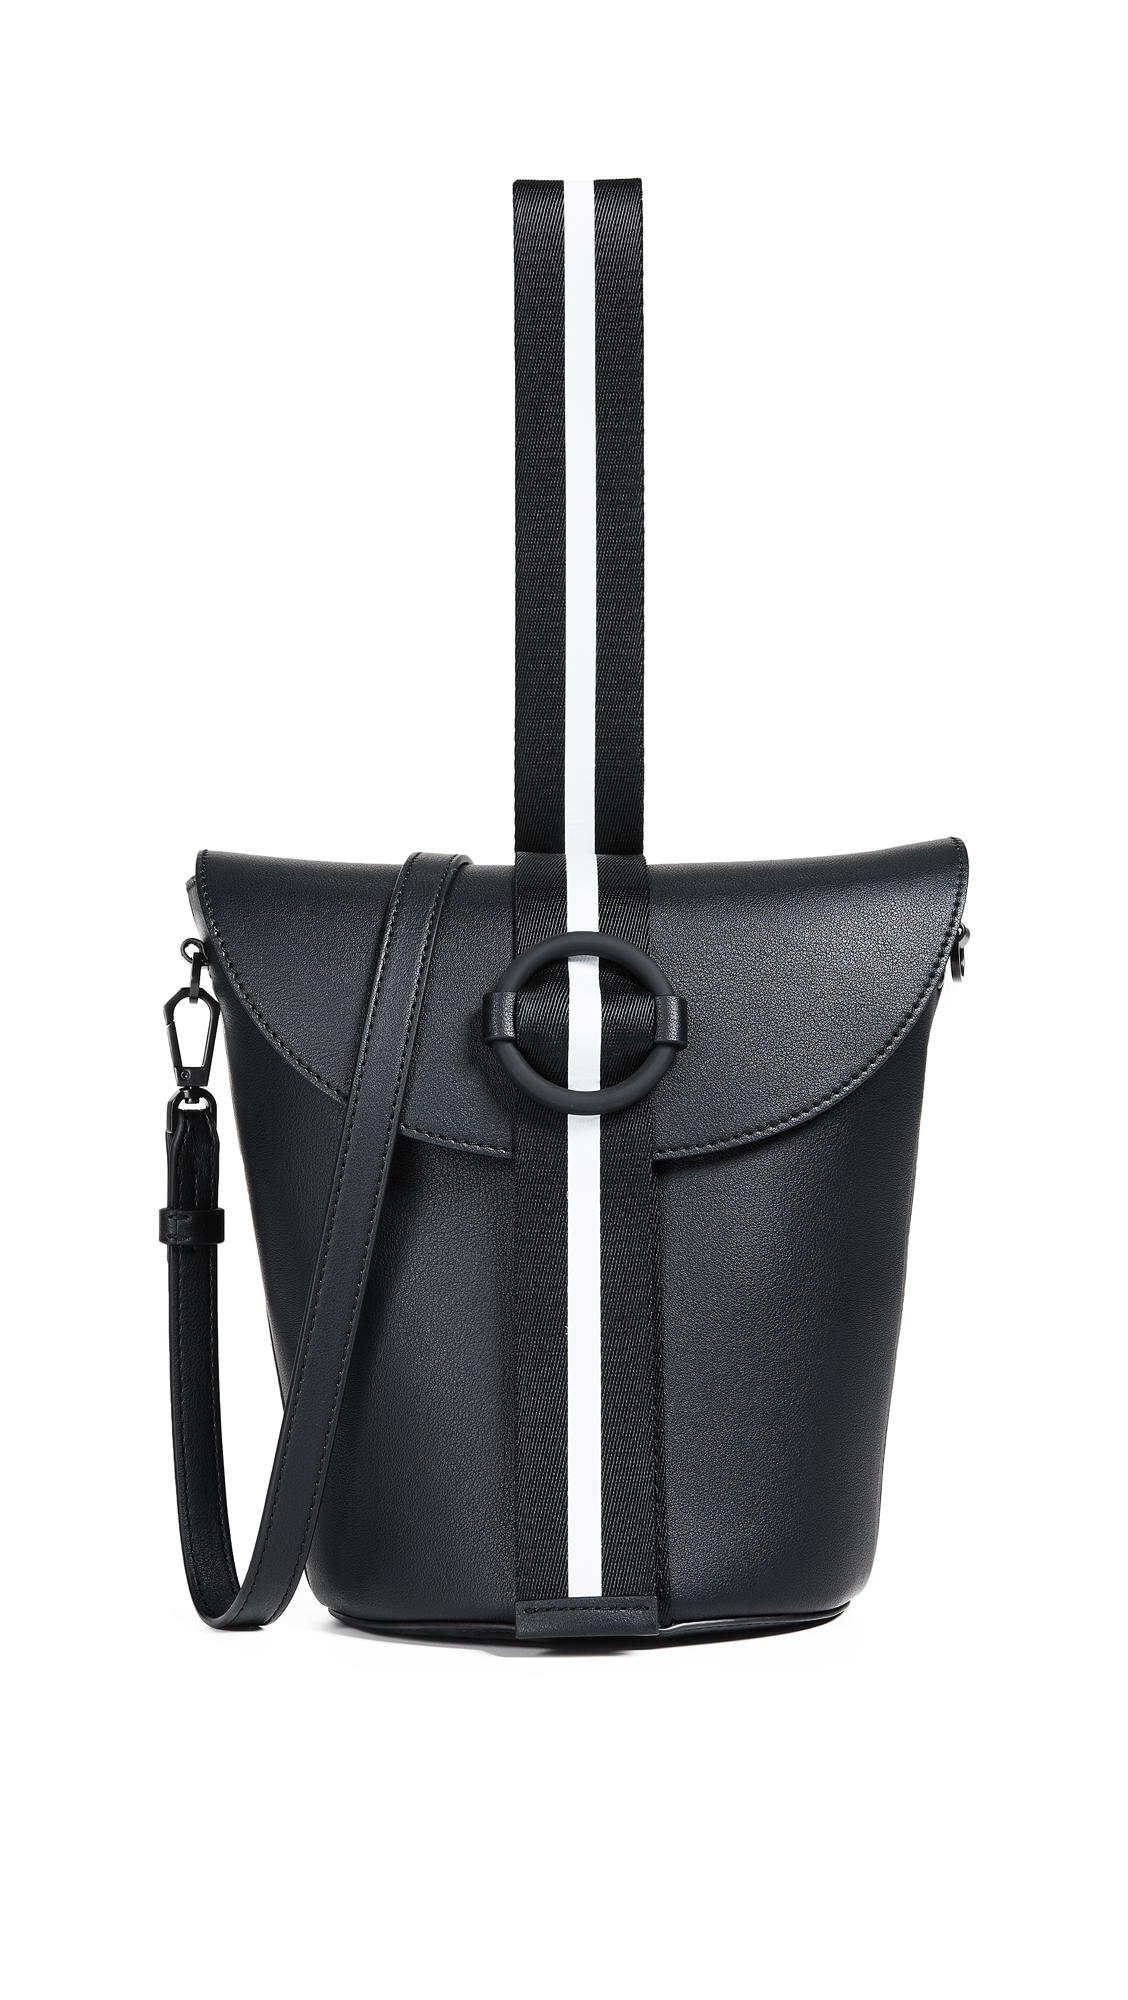 KENDALL + KYLIE Vivian Cross Body Bag